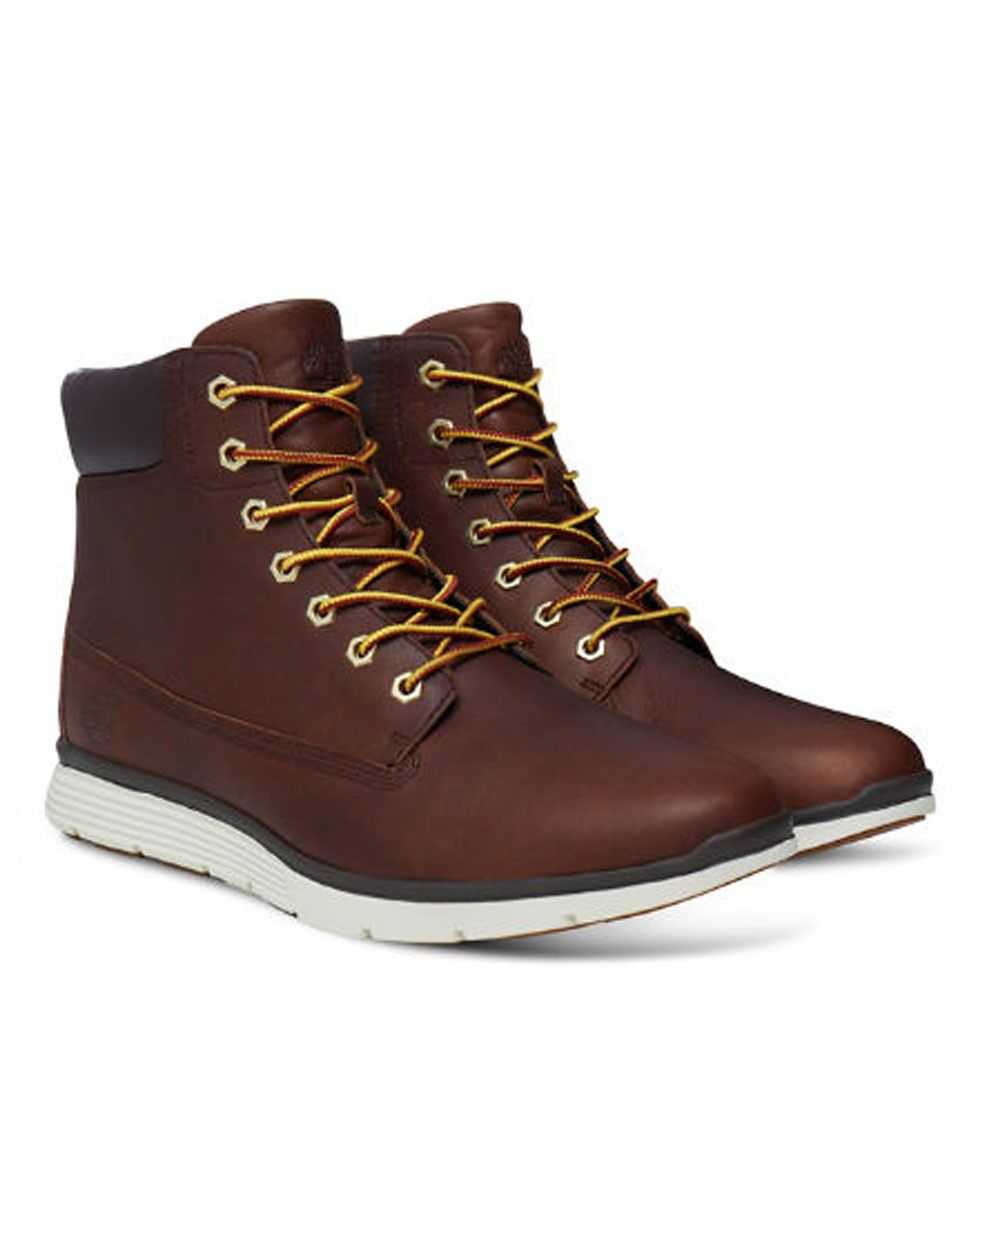 b3e4647d199 Timberland Killington 6 Inch Size 13/14/15 Boot (dark rubber ...